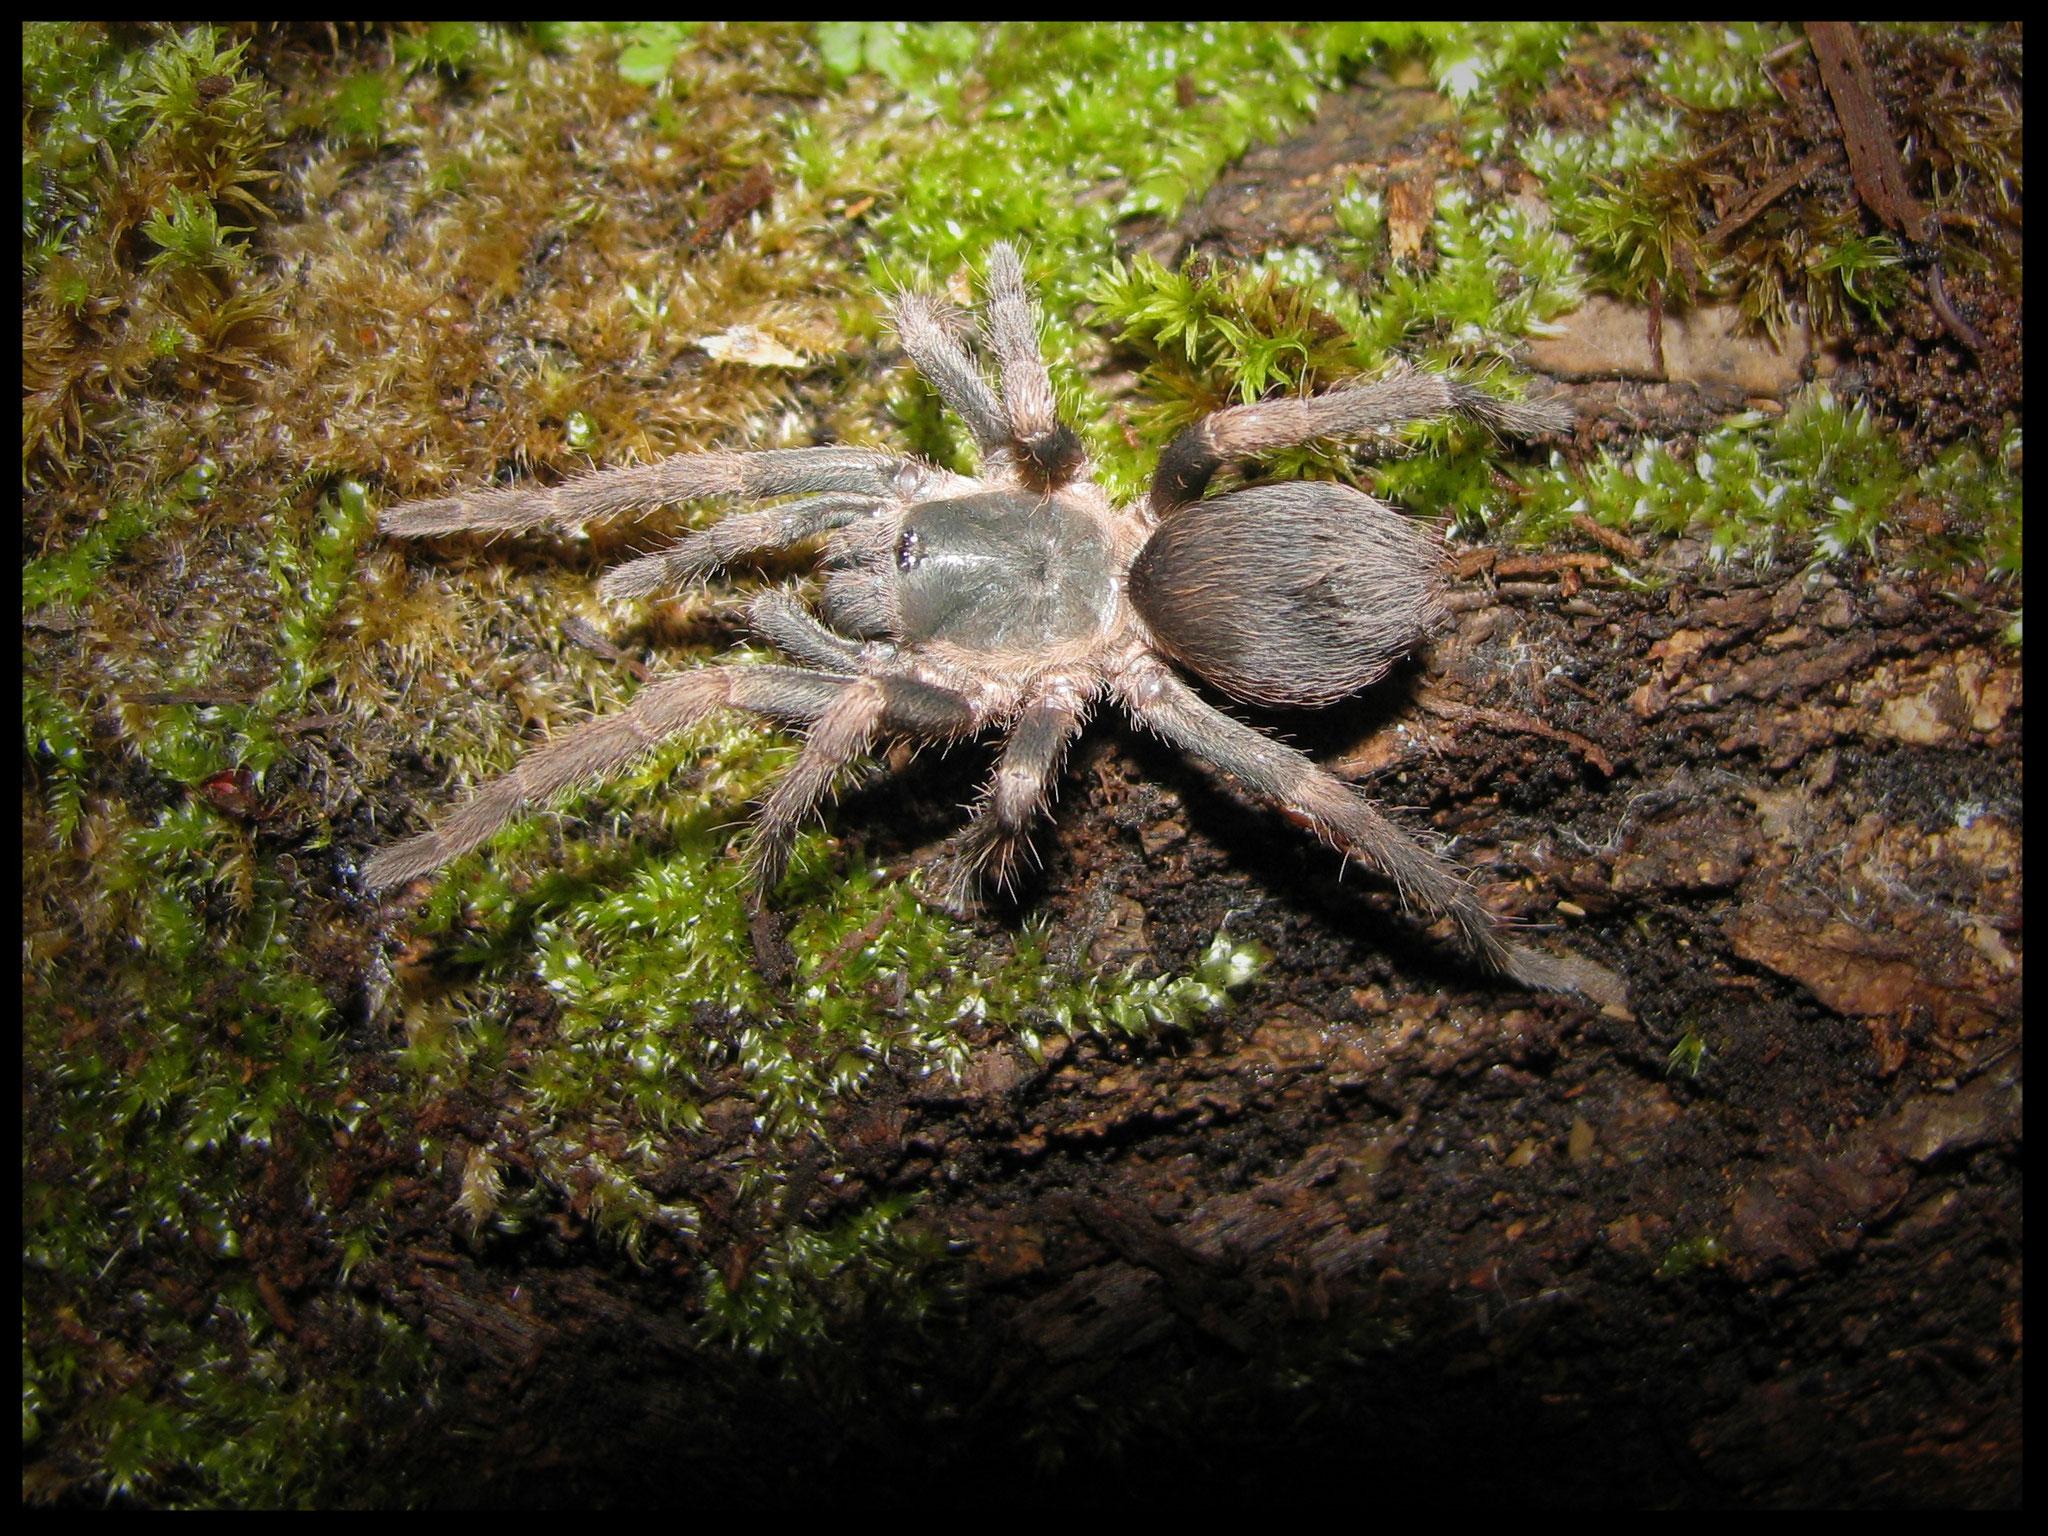 0.1 Theraphosinae sp. cuña, juvenil